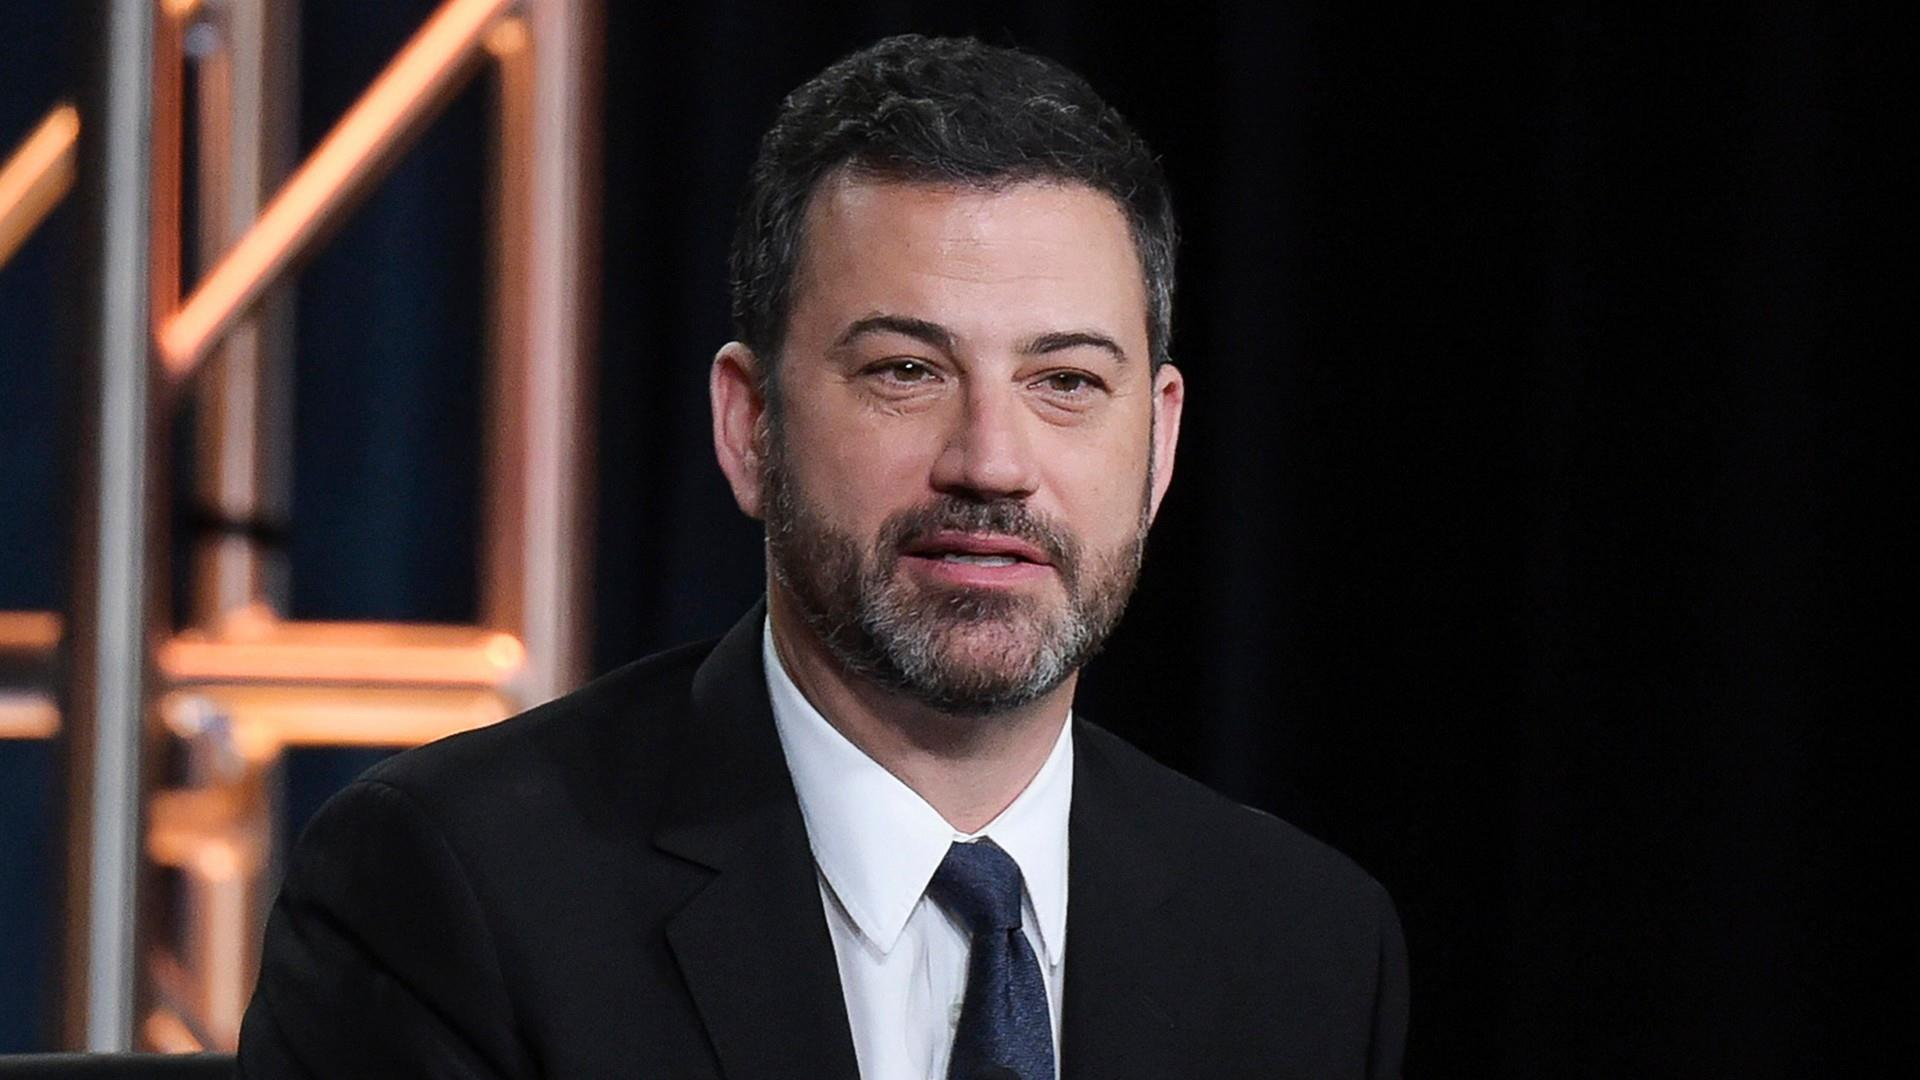 Jimmy Kimmel apologizes for joke about Melania Trump